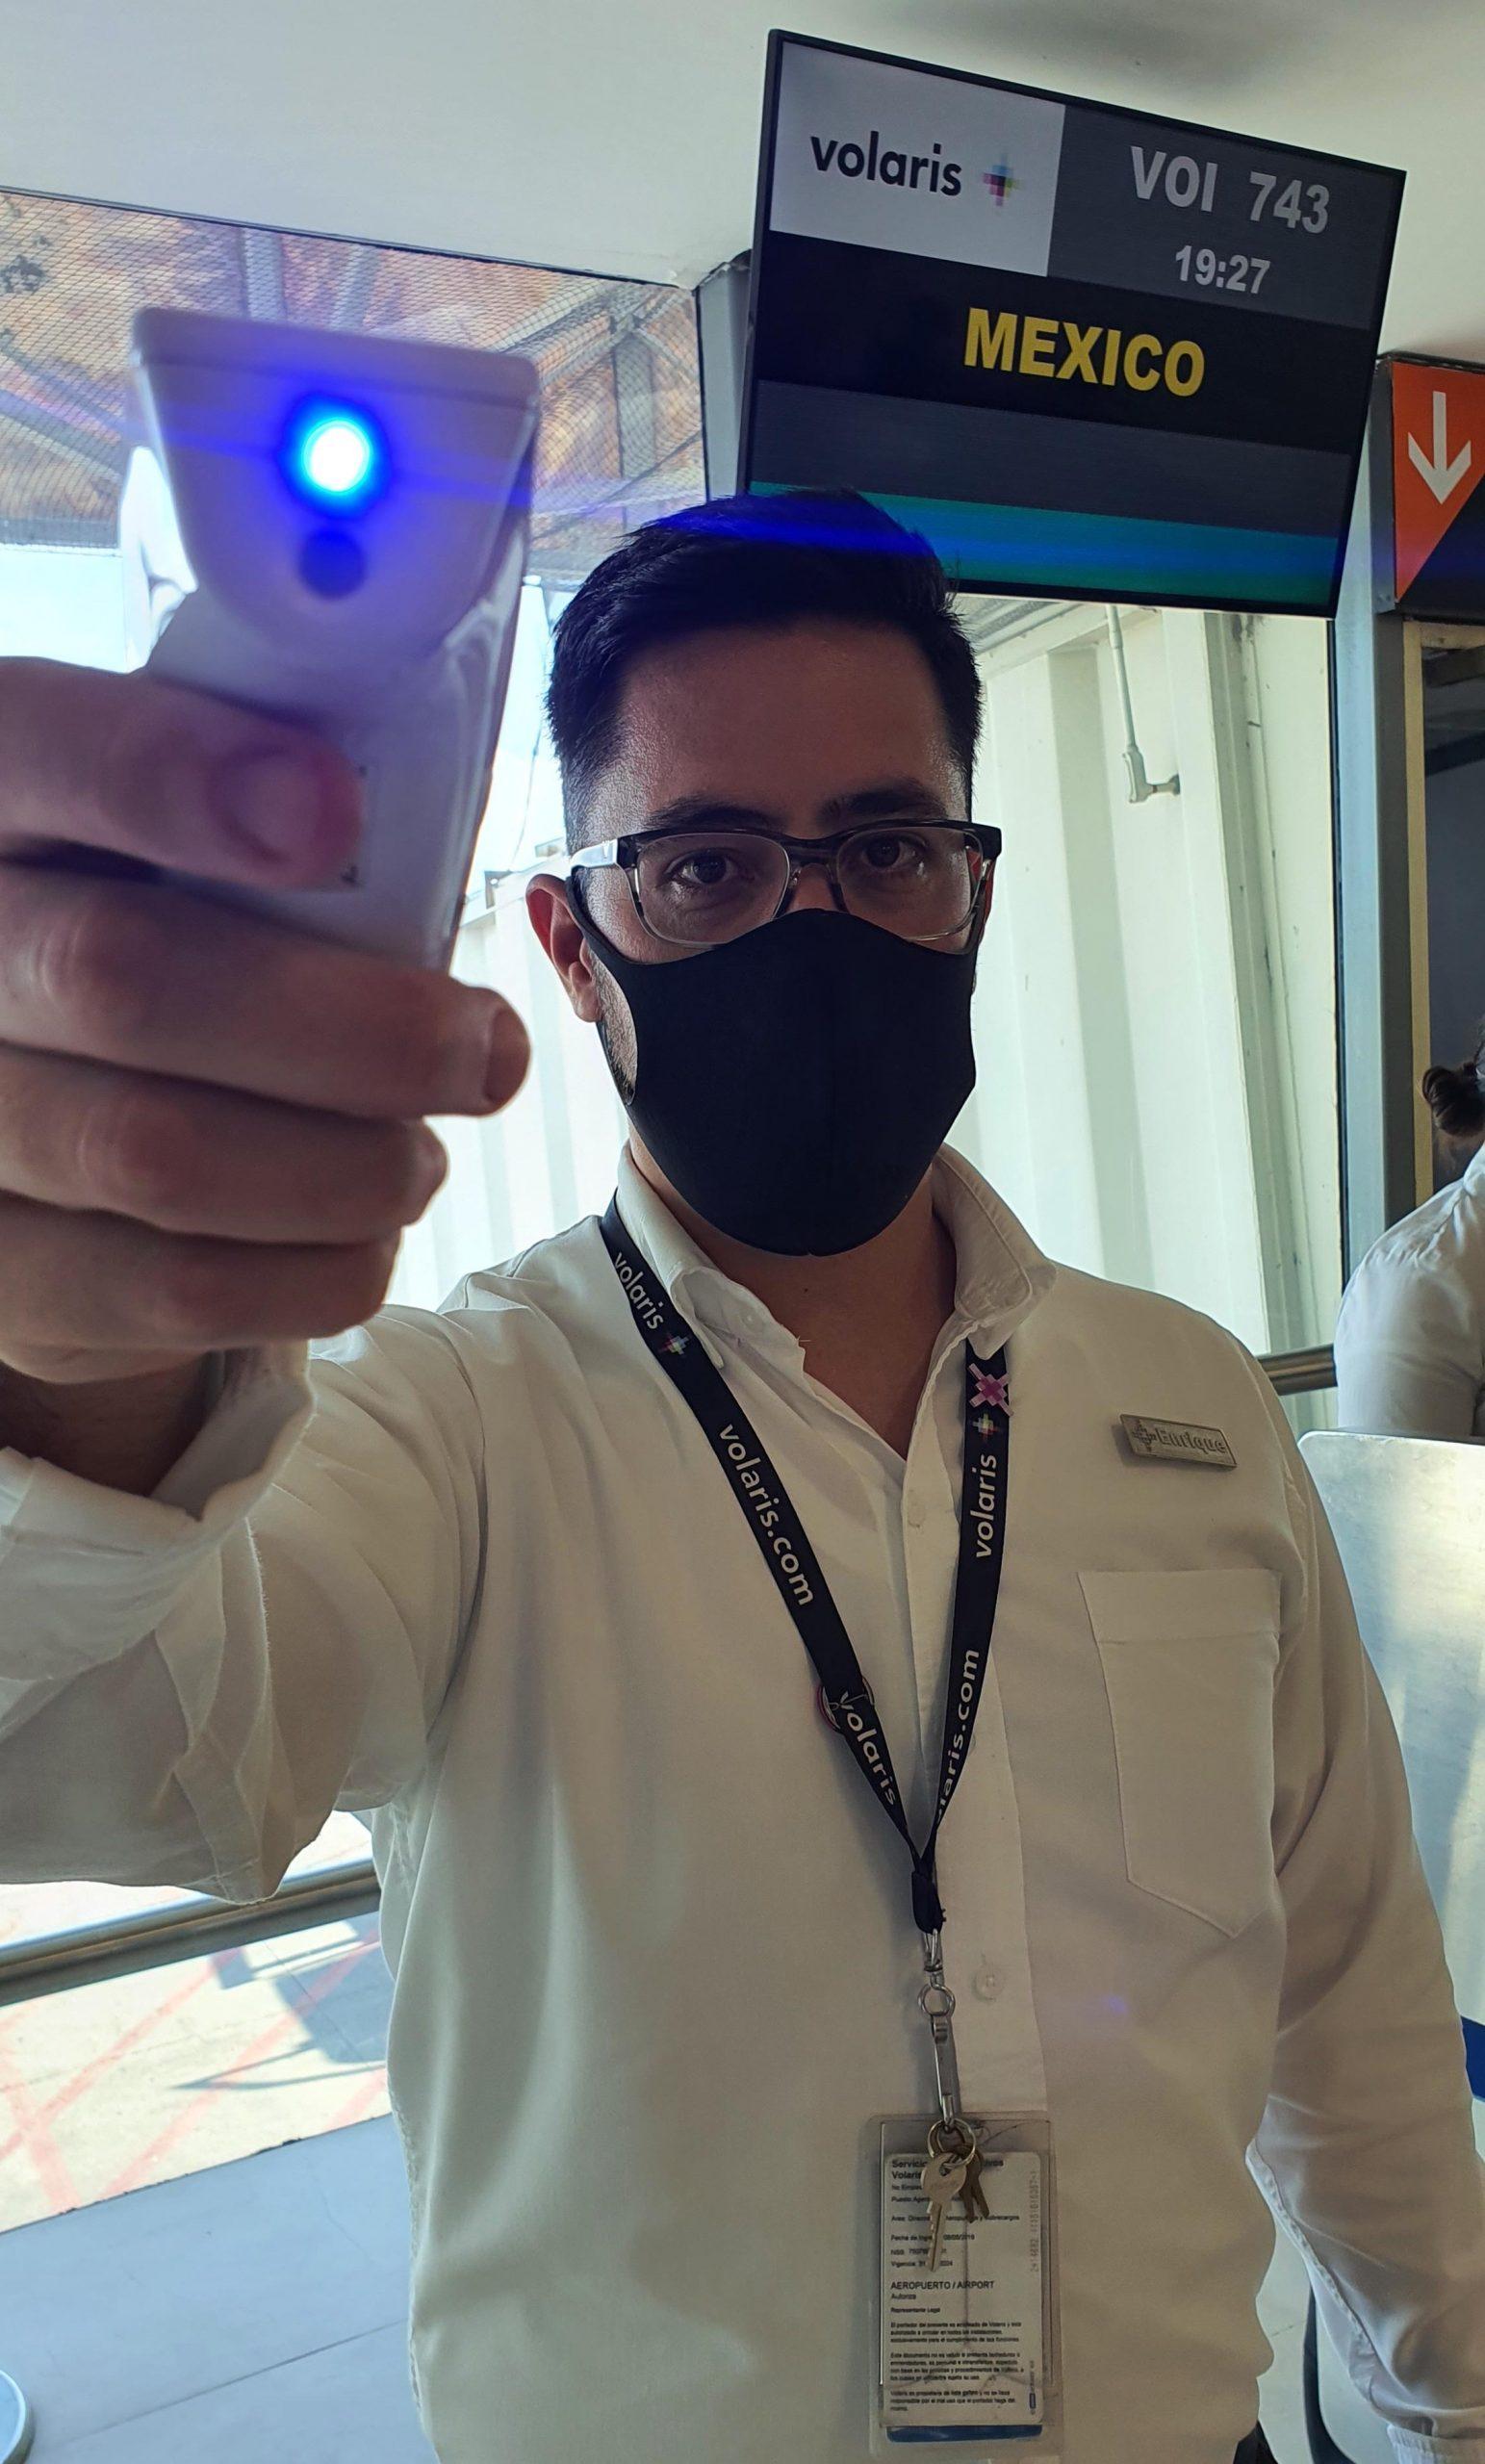 Volaris nuevo reglamento viajes covid pandemia coronavirus viajes 02